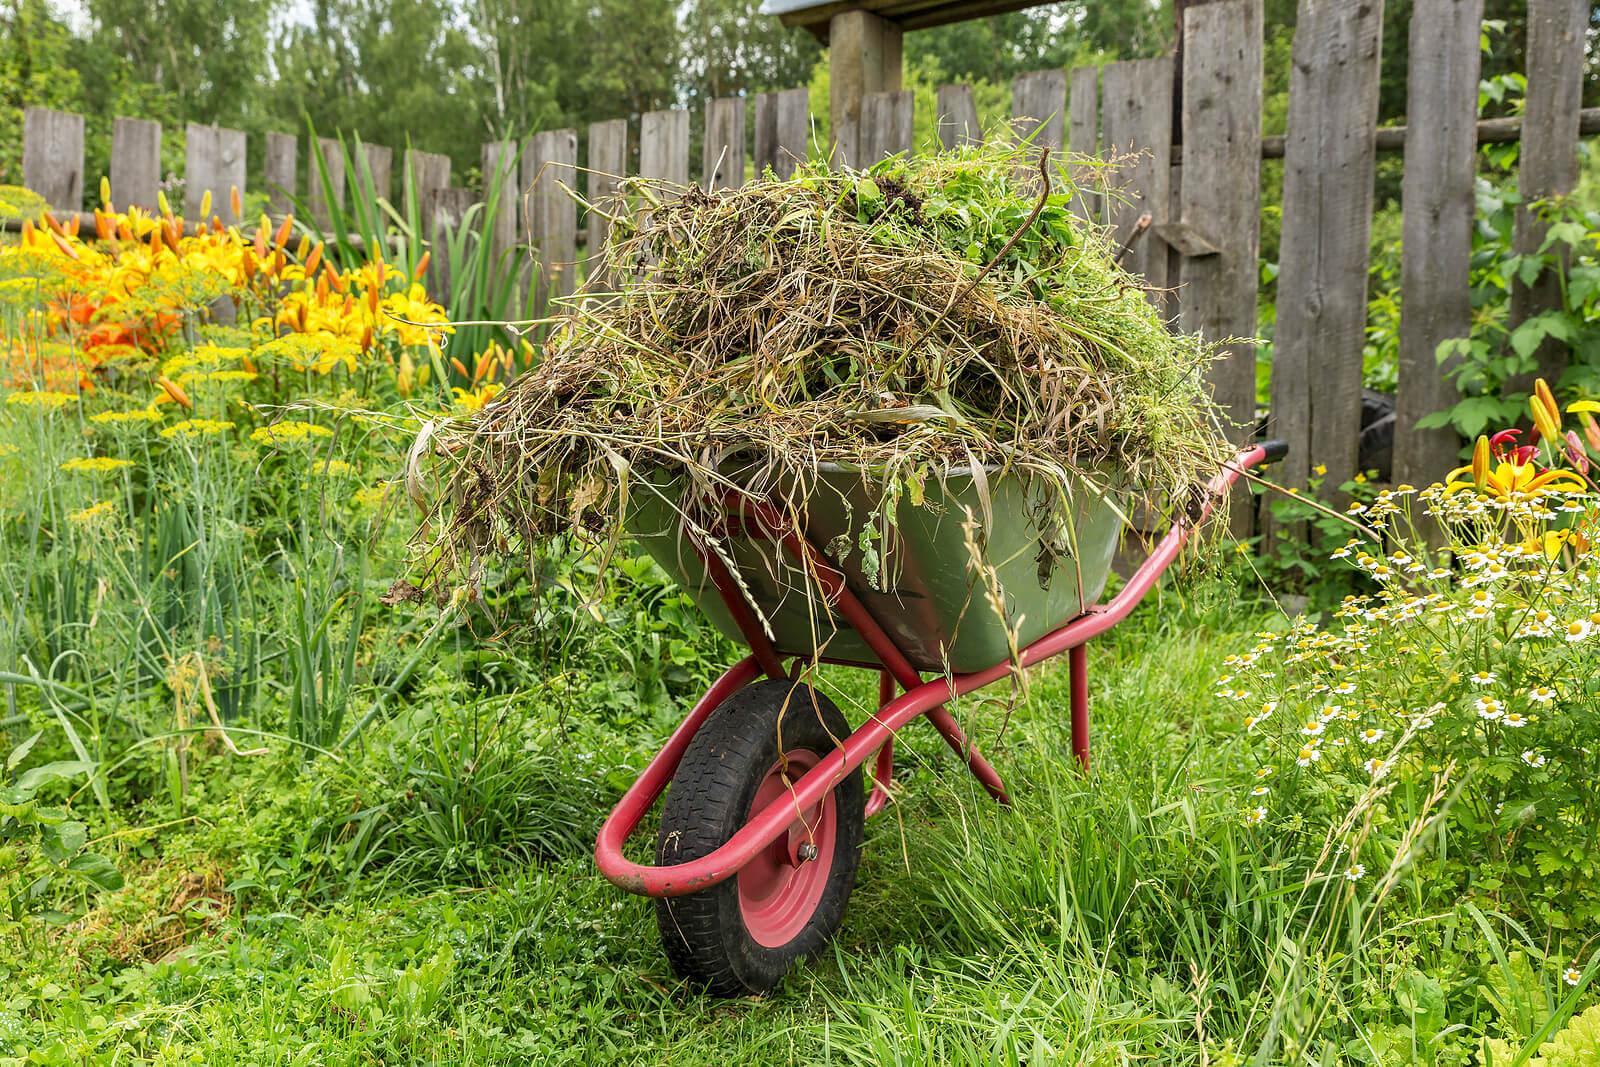 Garden waste in a red wheelbarrow, located in a garden